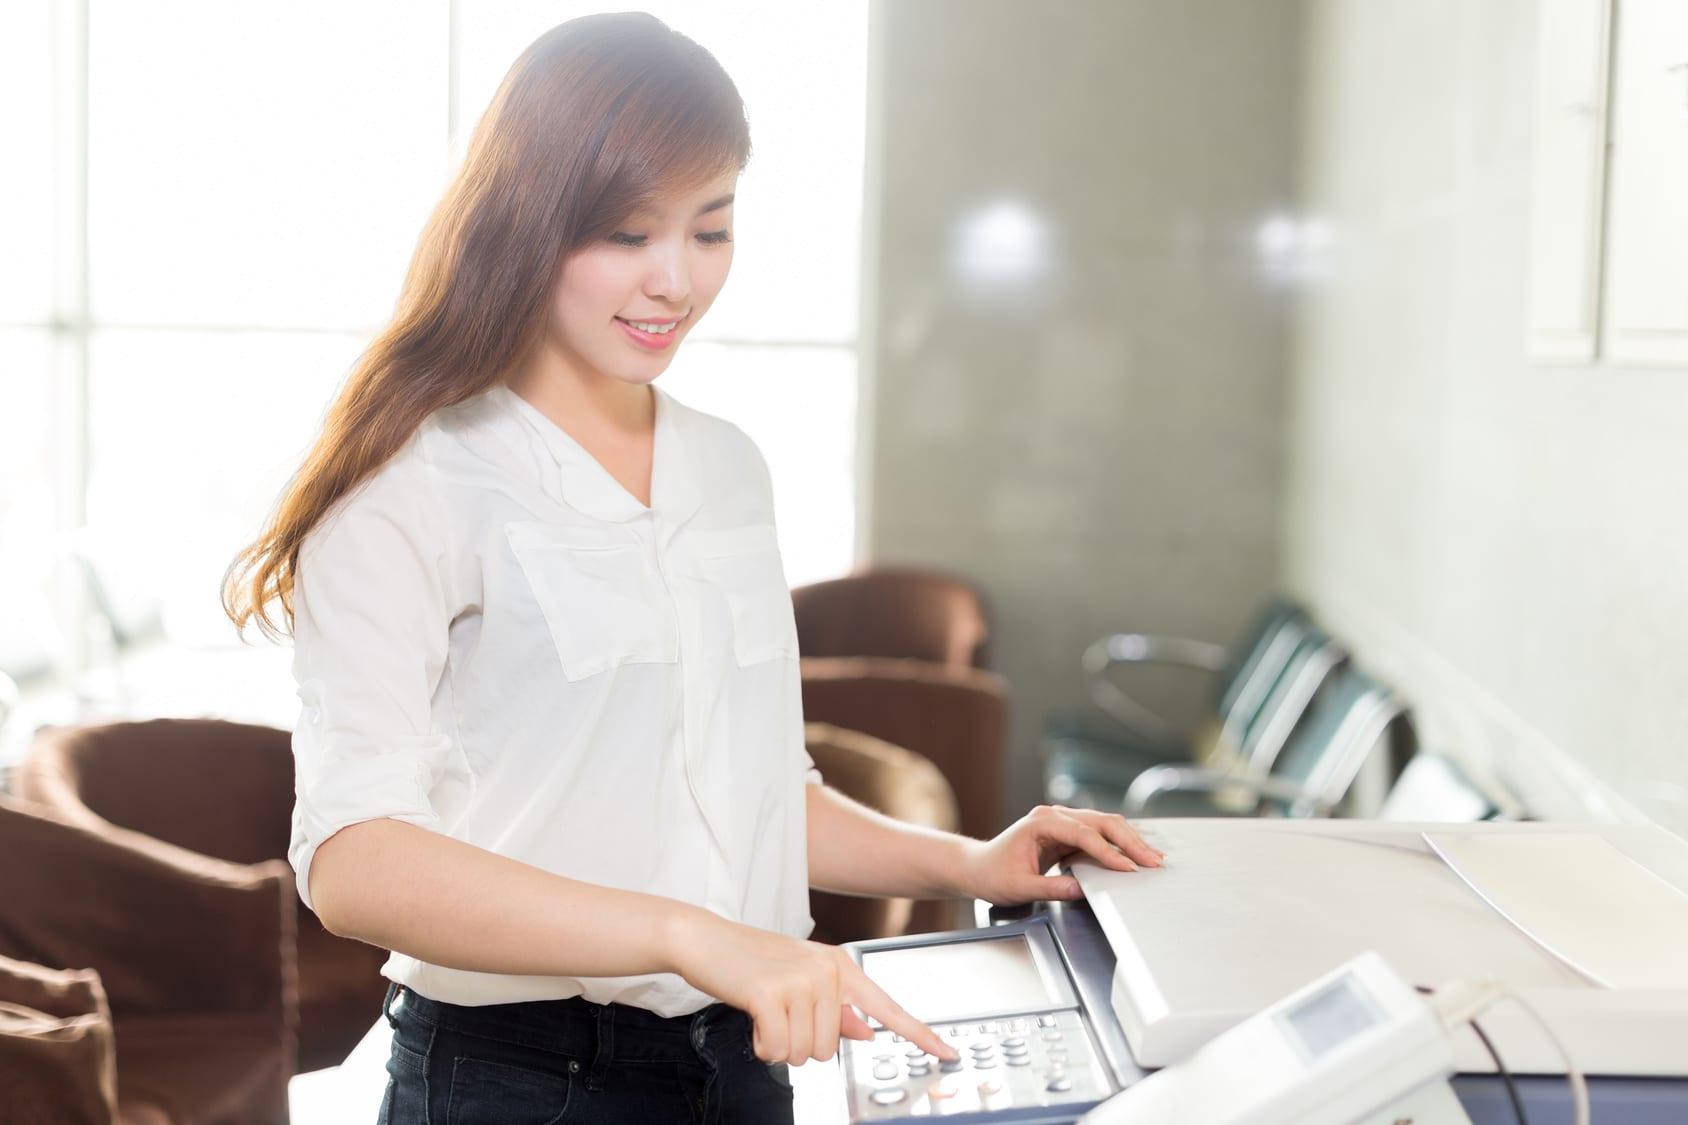 Girl Sitting On Copy Machine